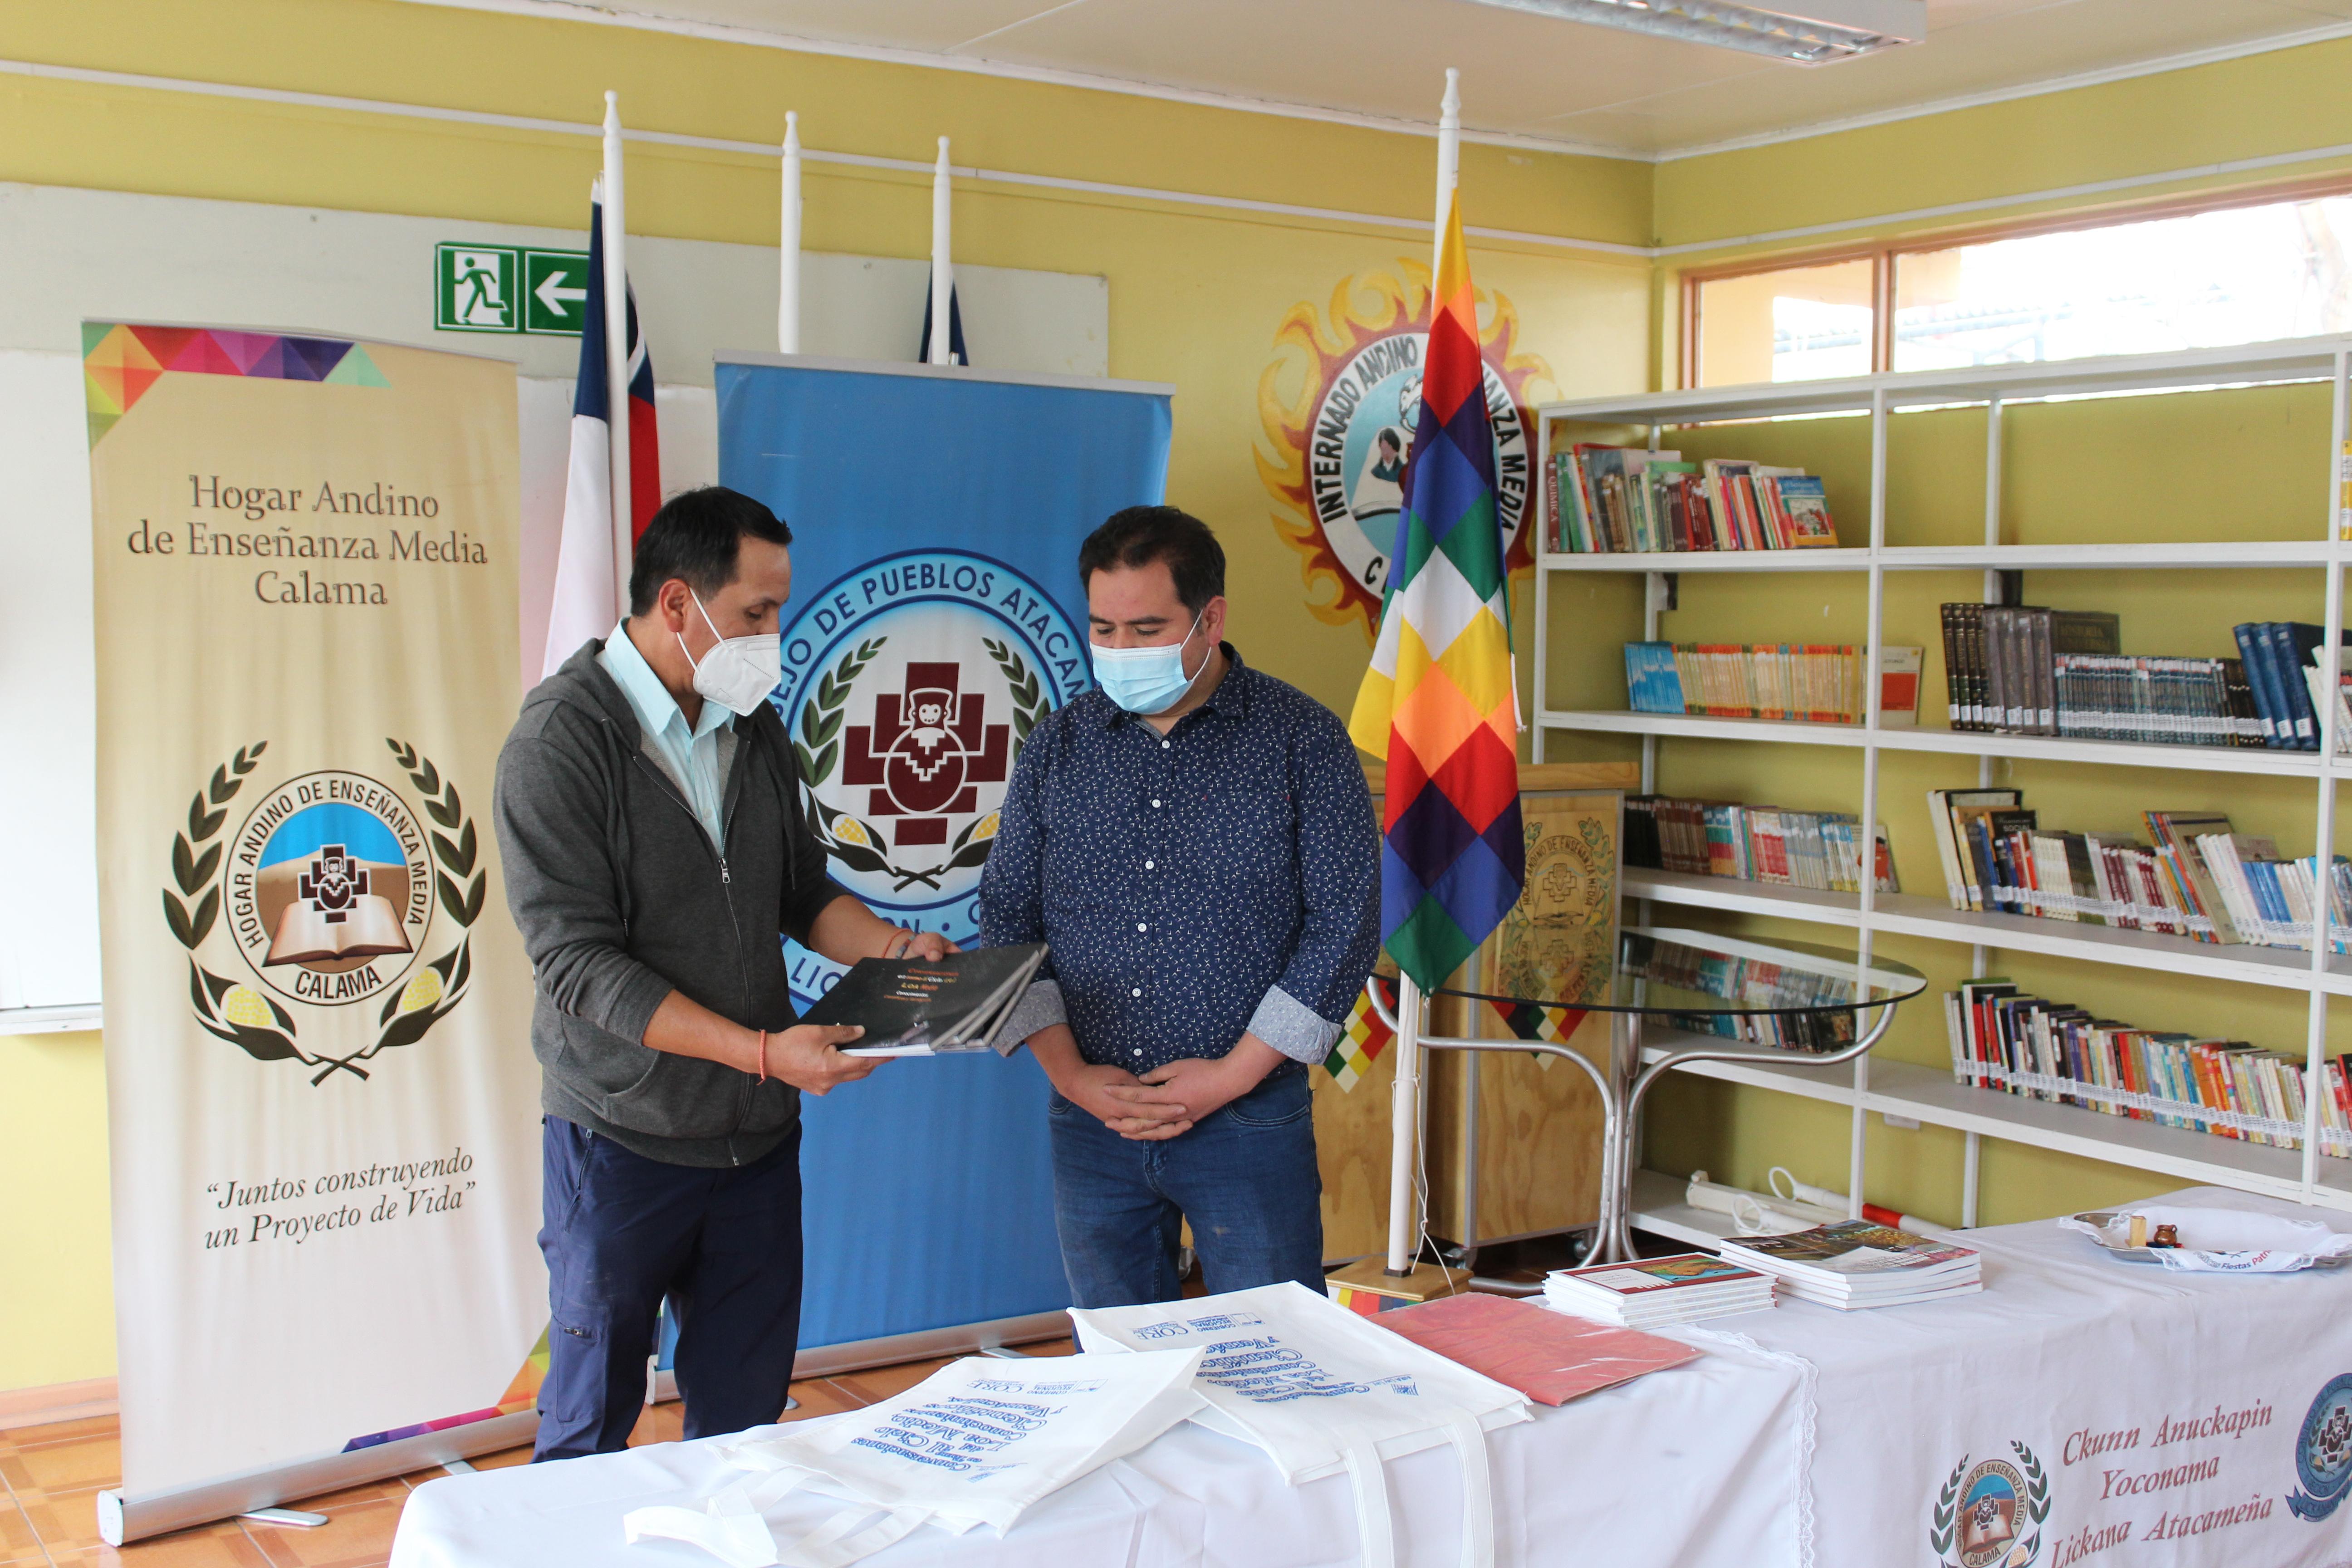 Asociación AIRA Lay Lay dona libro que rescata la cosmovisión Lican Antay al Hogar Andino de Calama